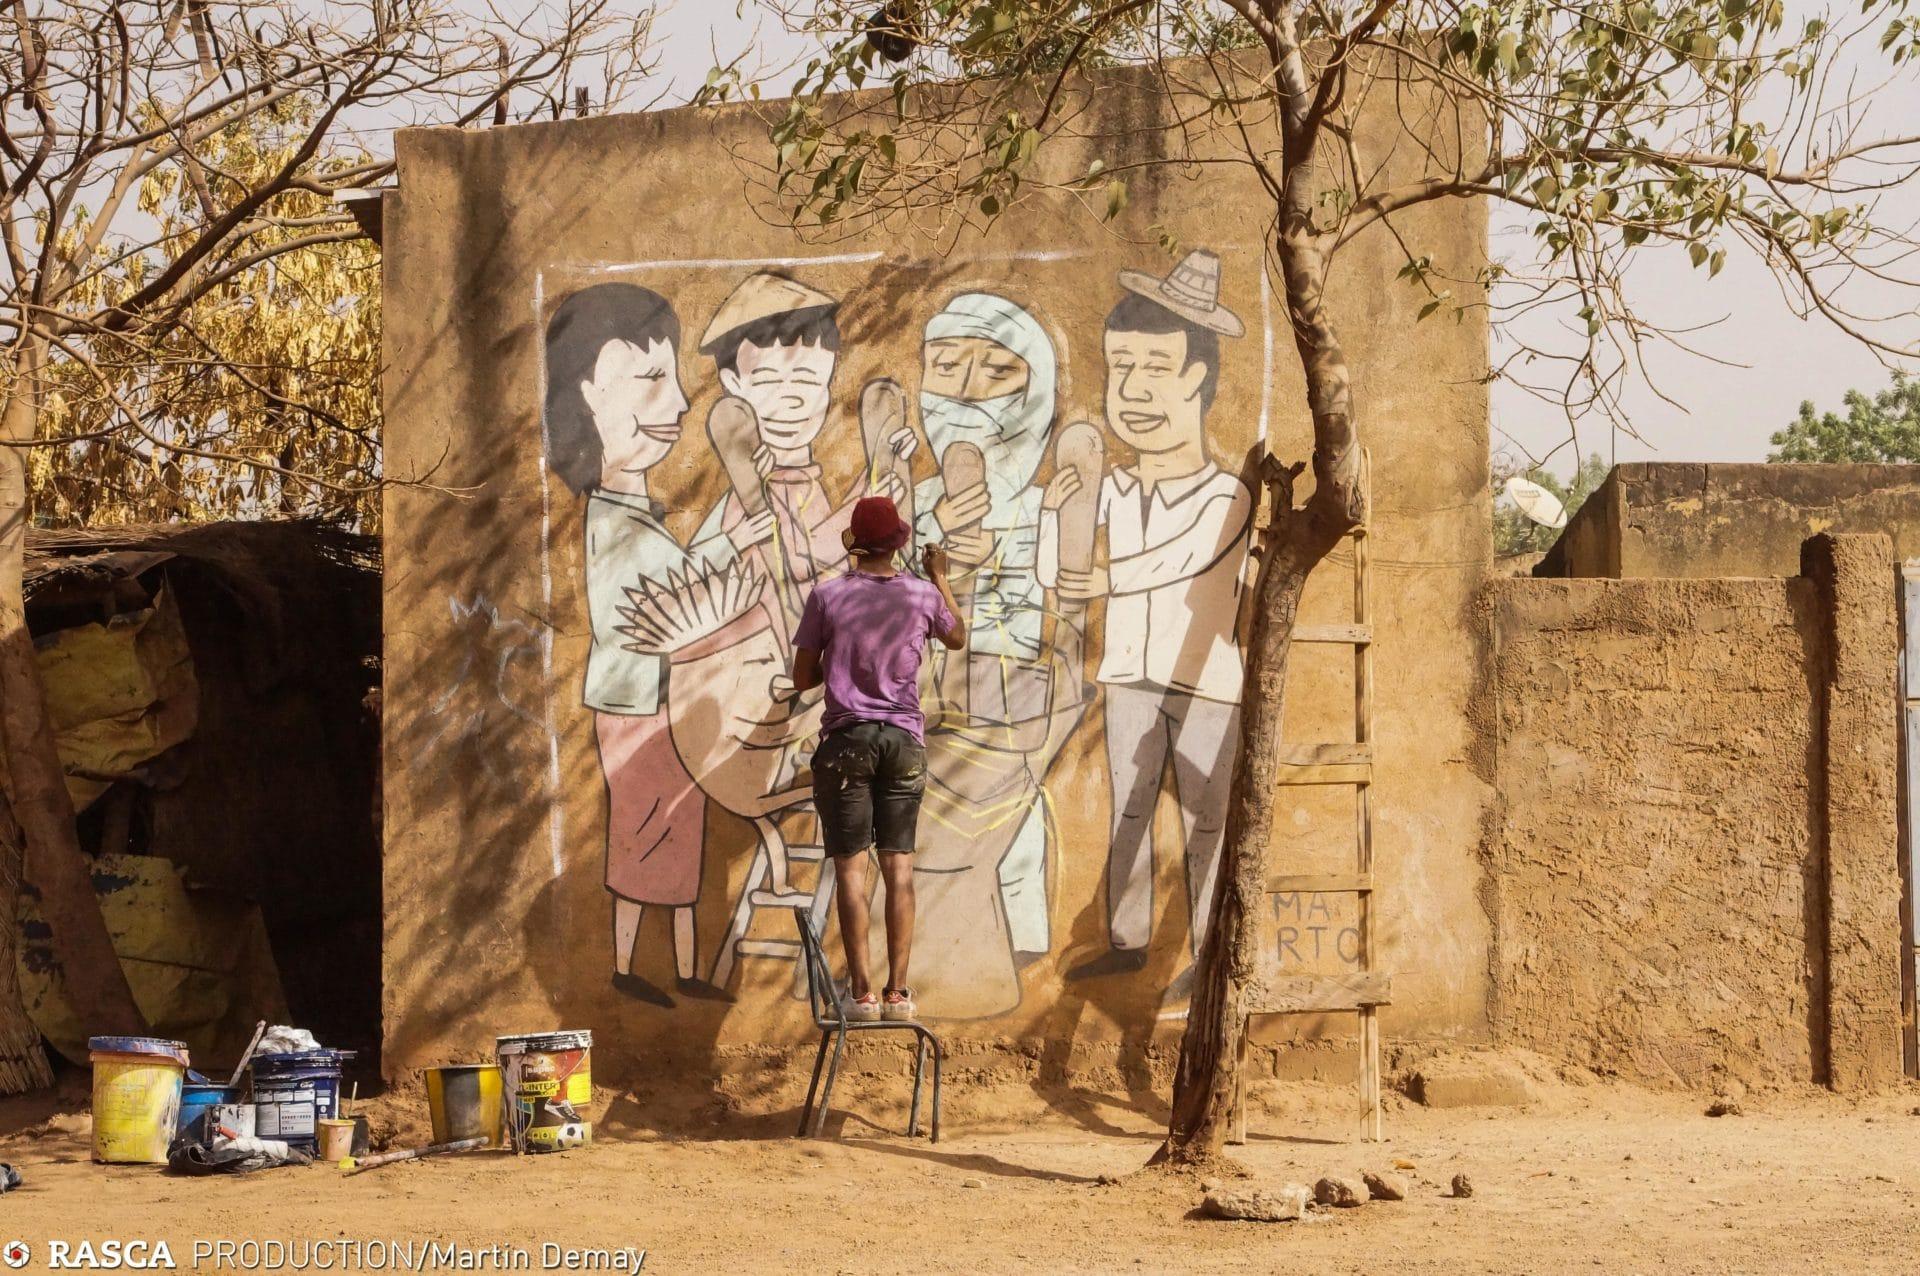 DRIP'IN is inspired by El Marto's murals at Ouagadougou